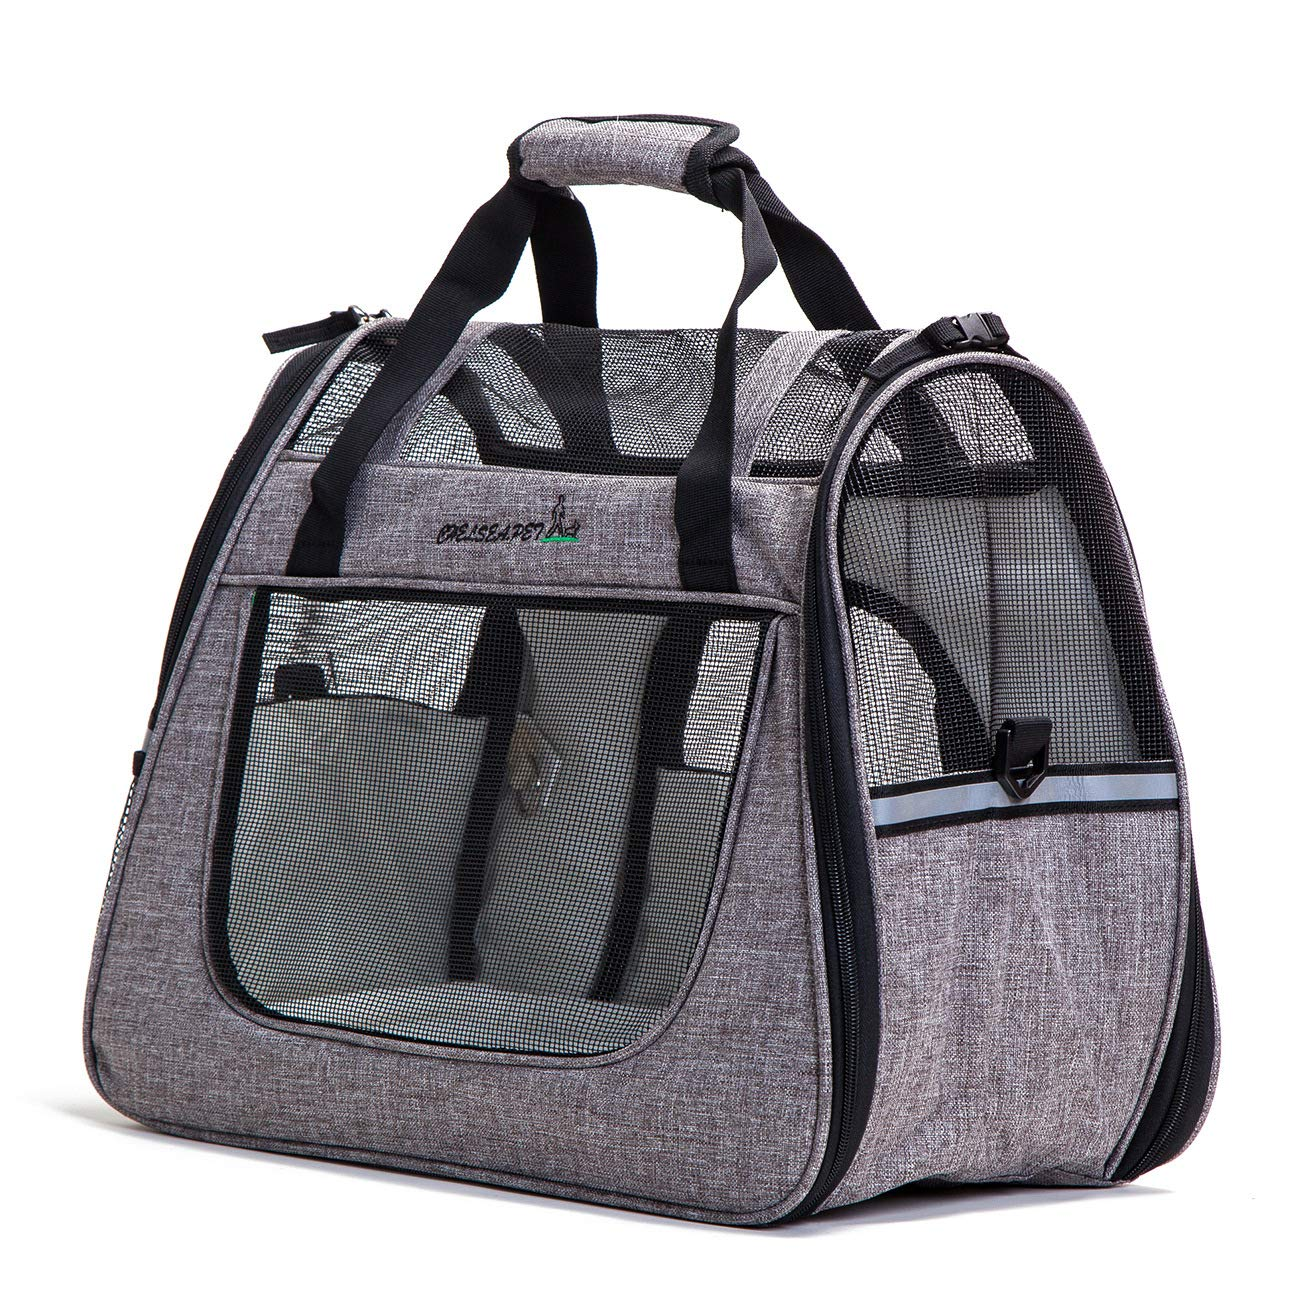 Pet Carrier Soft Dog & Cat Small Carrier, Foldable Pet Travel Carrier 45x25x34cm (Light Grey)